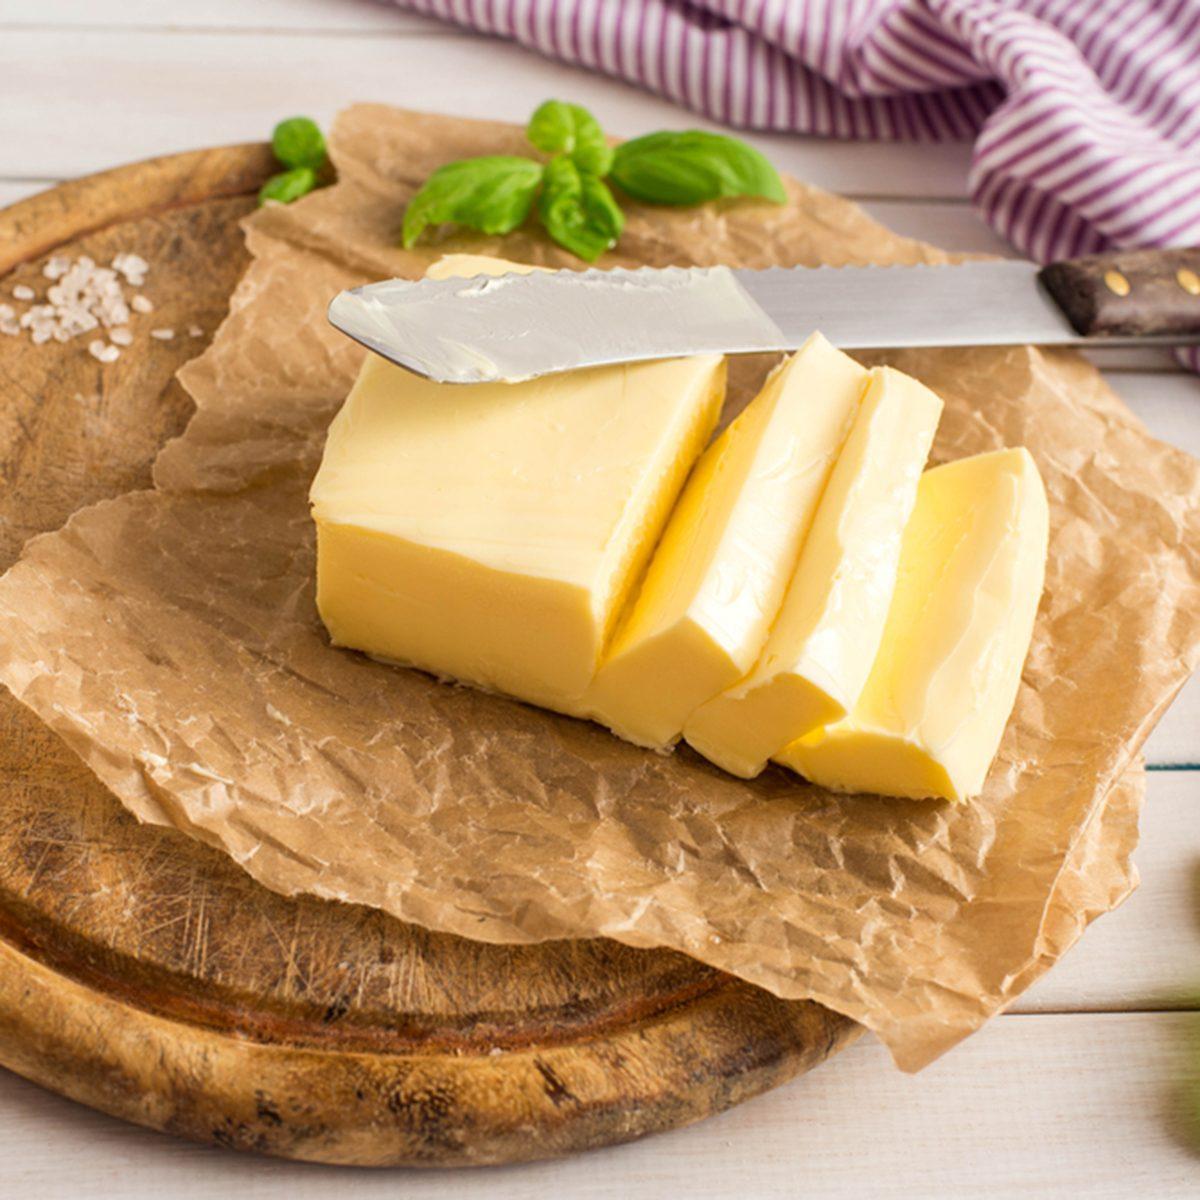 Slice of butter. Fresh sliced butter on the wooden plate.